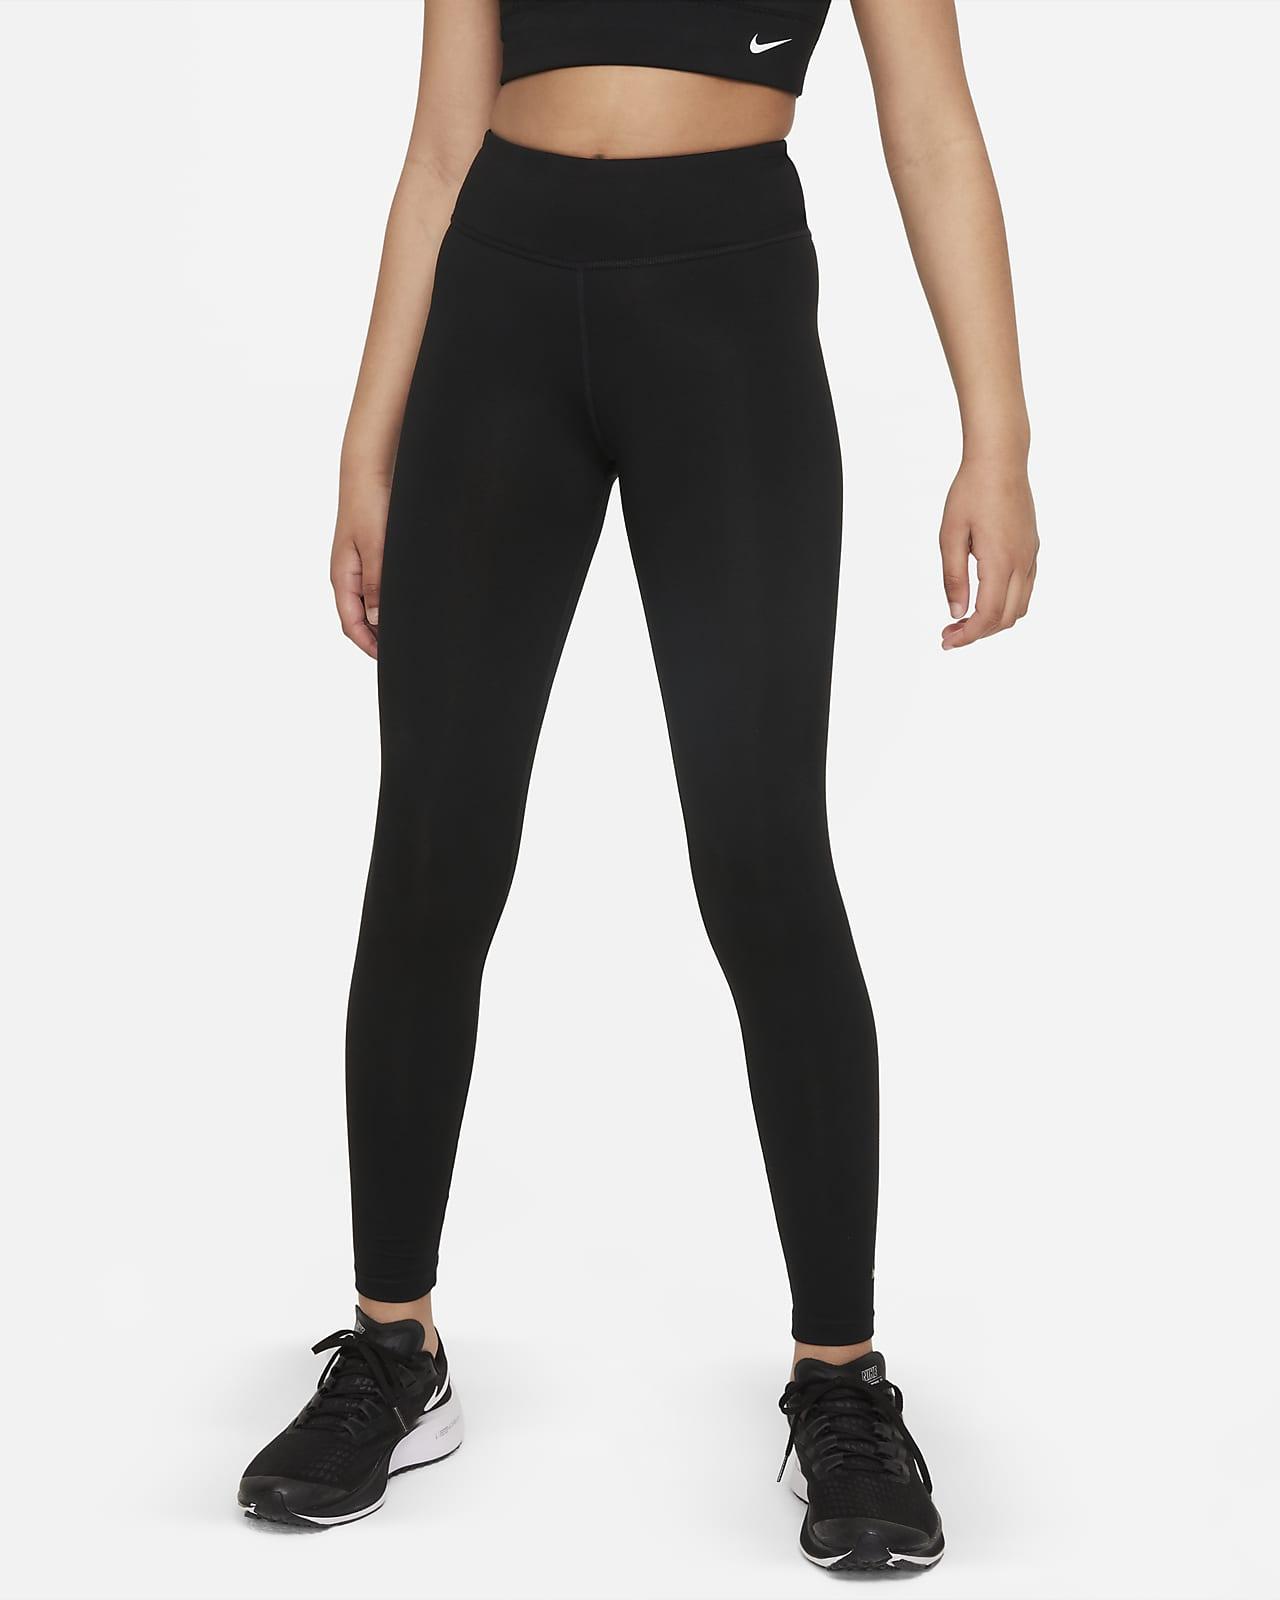 Nike Dri-FIT One Luxe Older Kids' (Girls') High-Rise Leggings